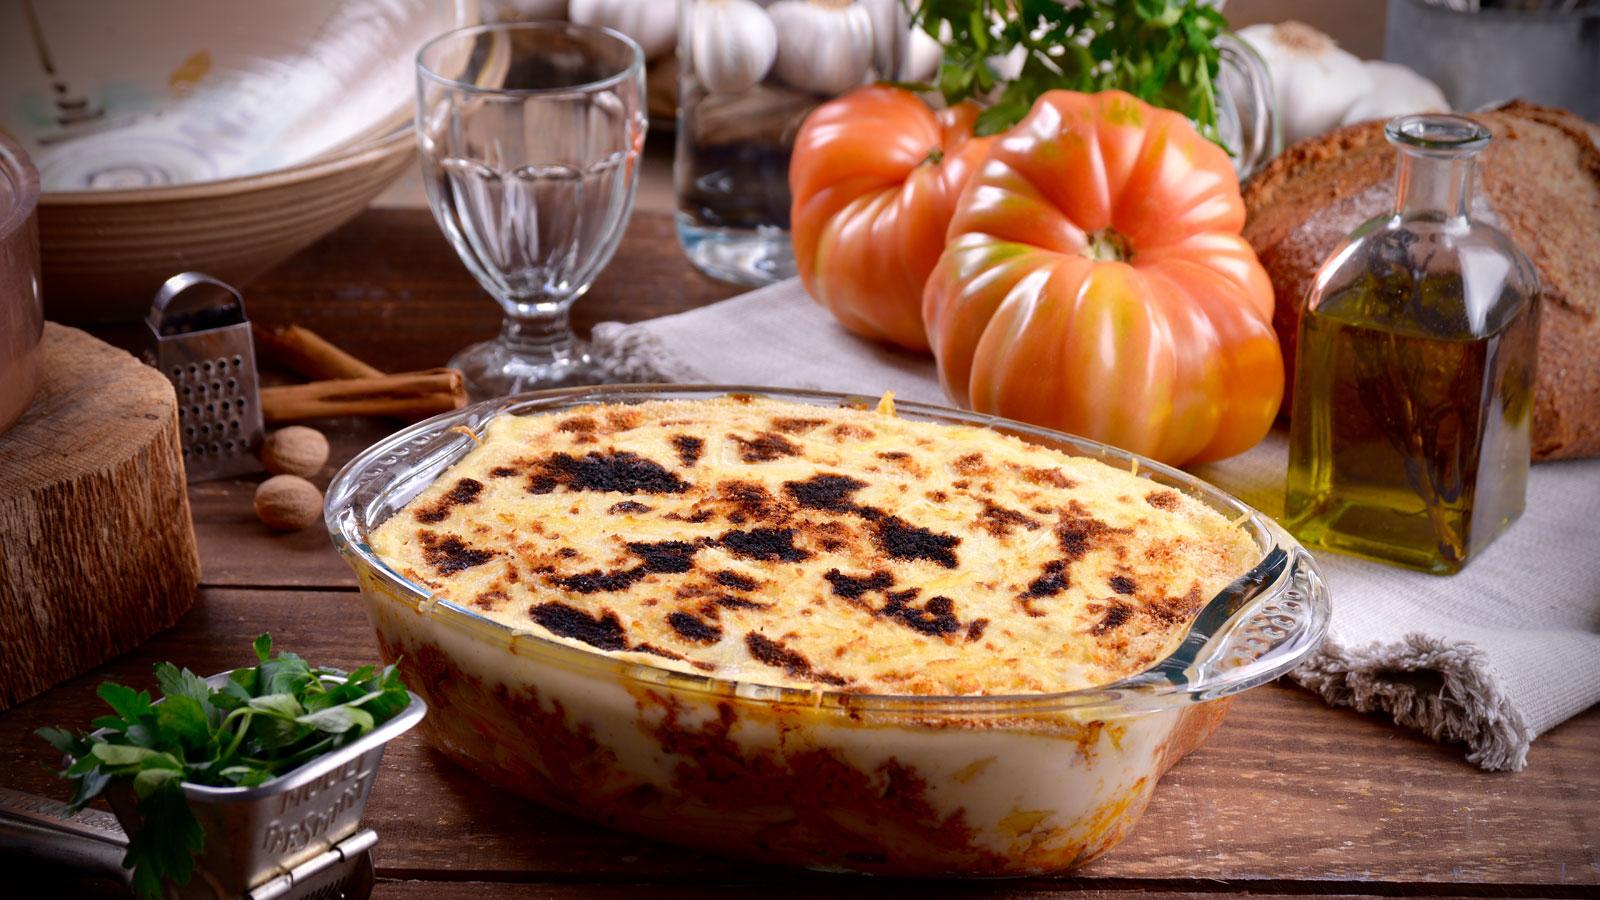 pastel de macarrones y carne pastitsio mar a zannia